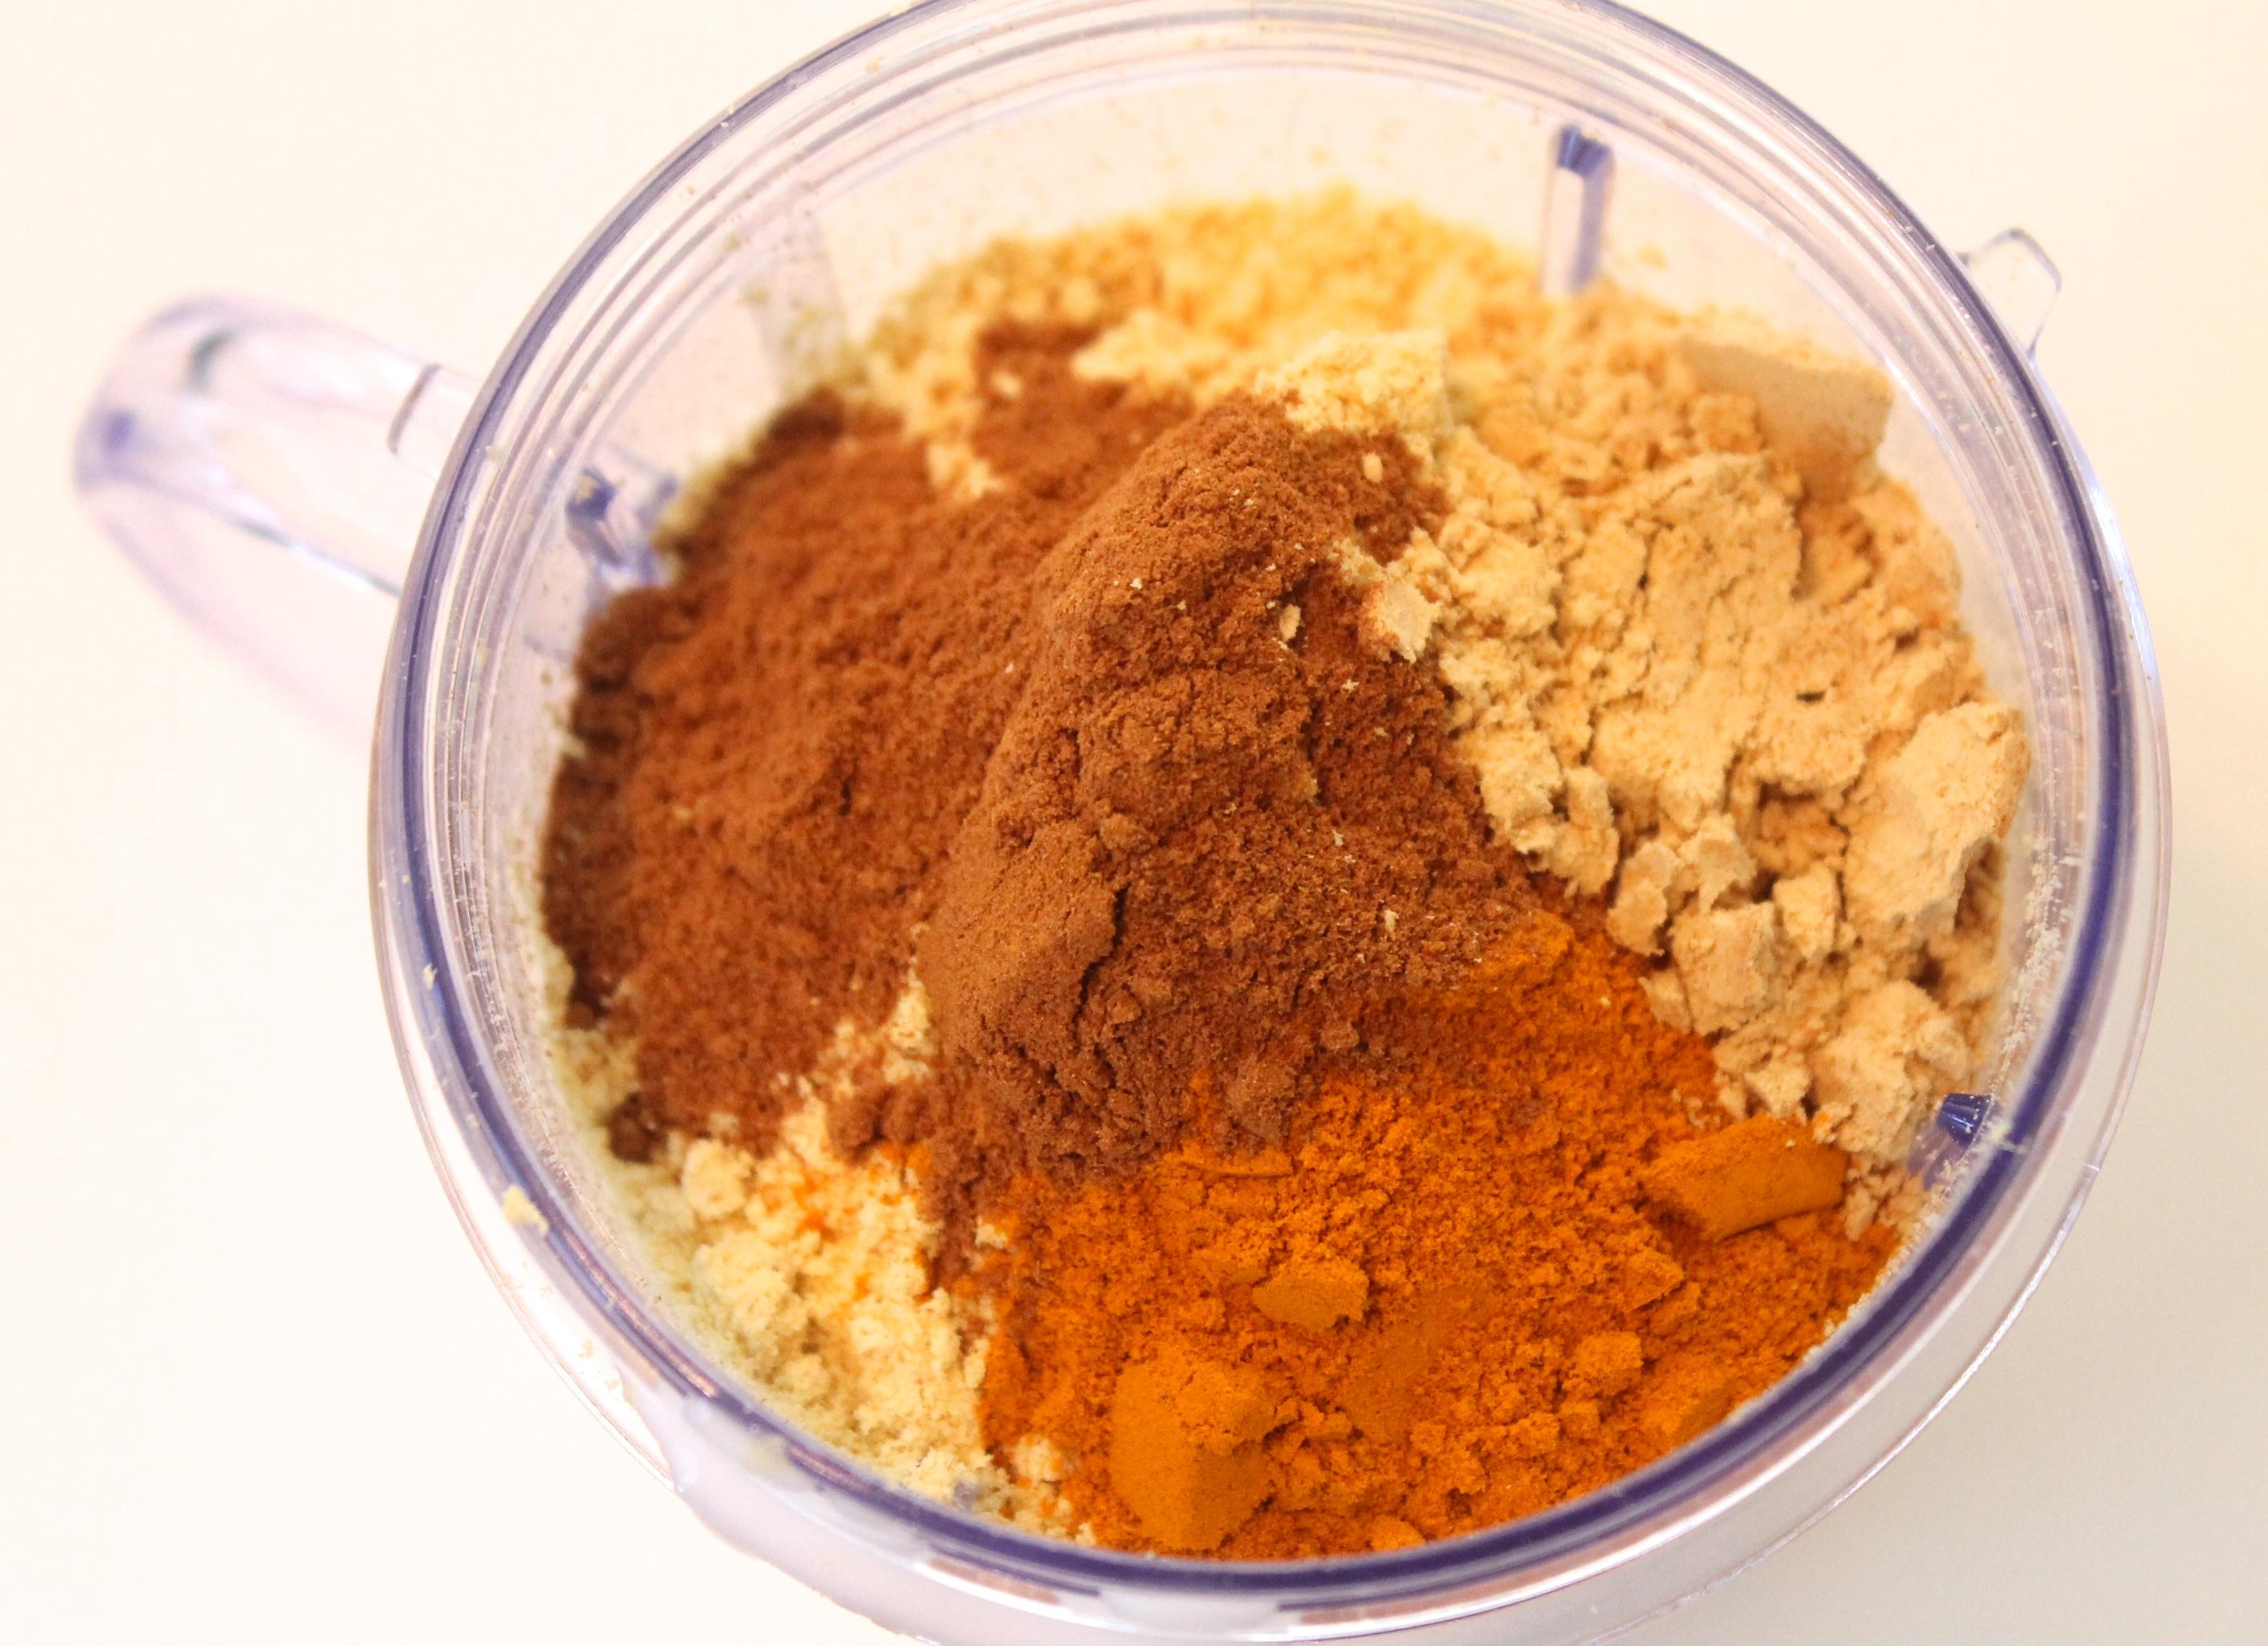 anti-inflammatory smoothie ingredients